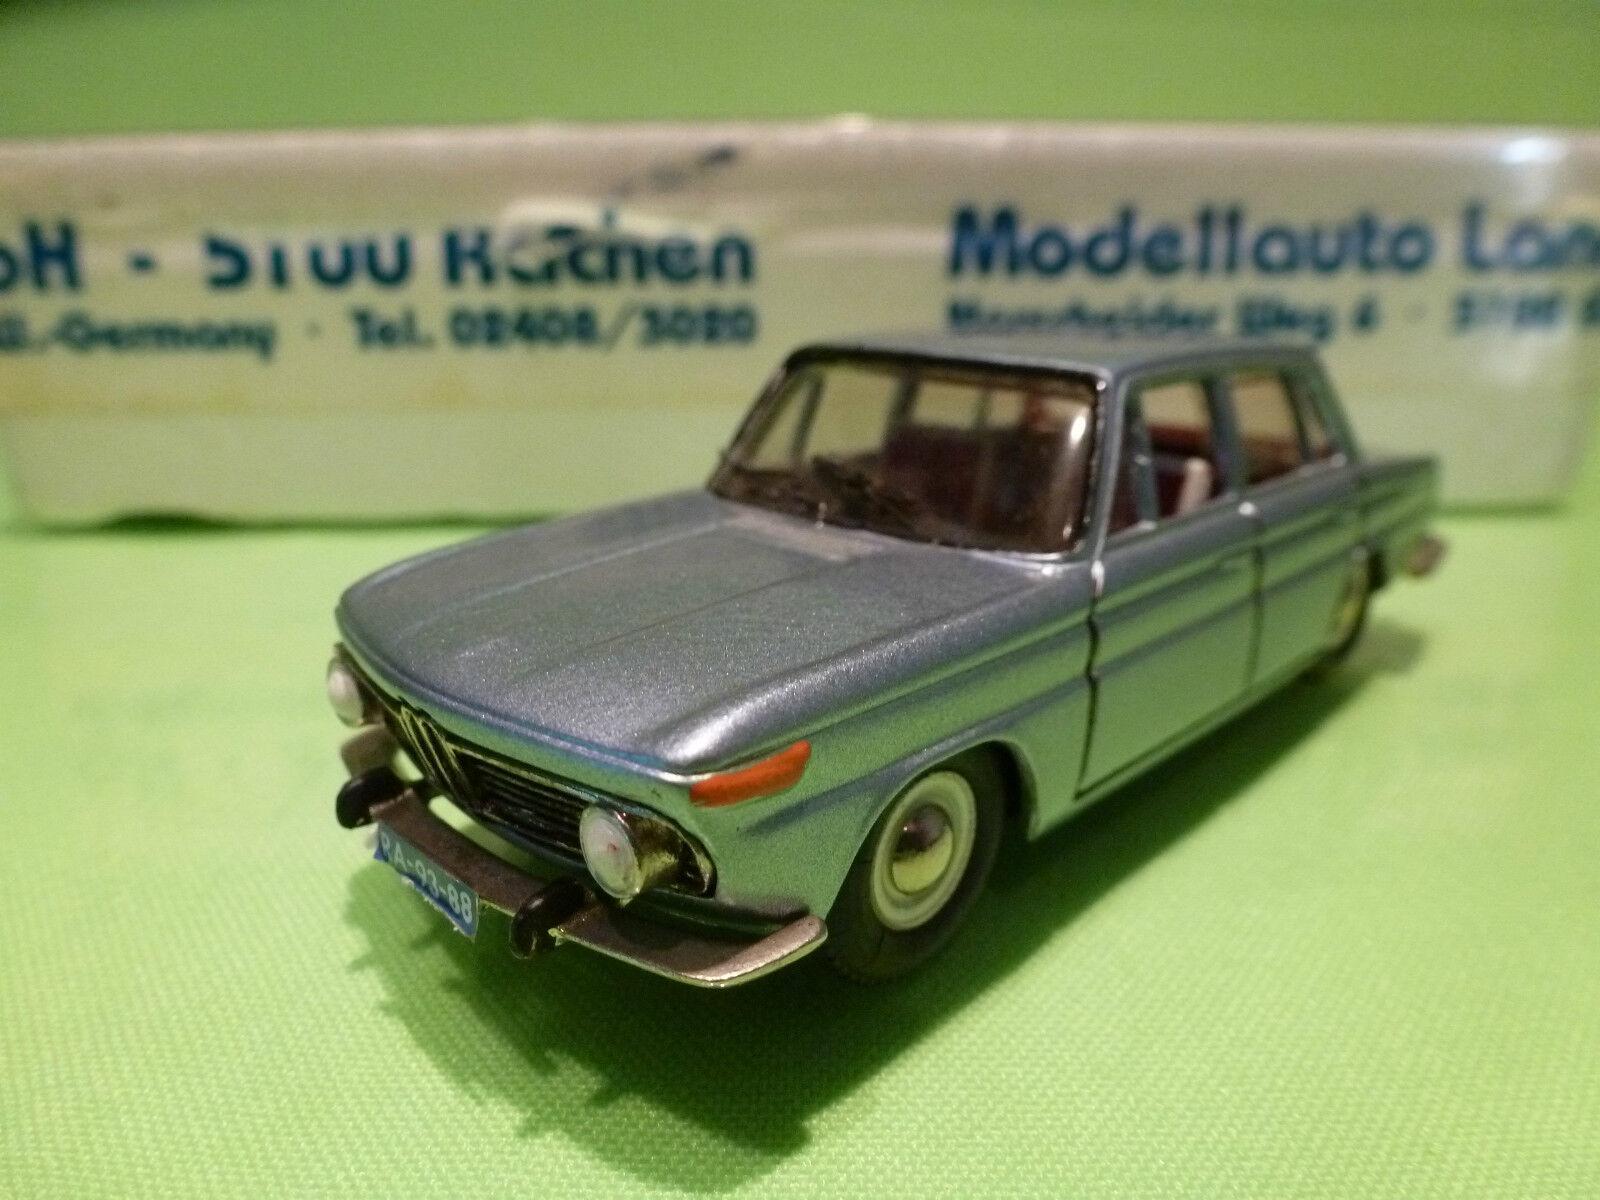 METAL BUILT KIT DANHAUSEN TIN WIZARD BMW 1500  1 43 - RARE SELTEN - VERY GOOD